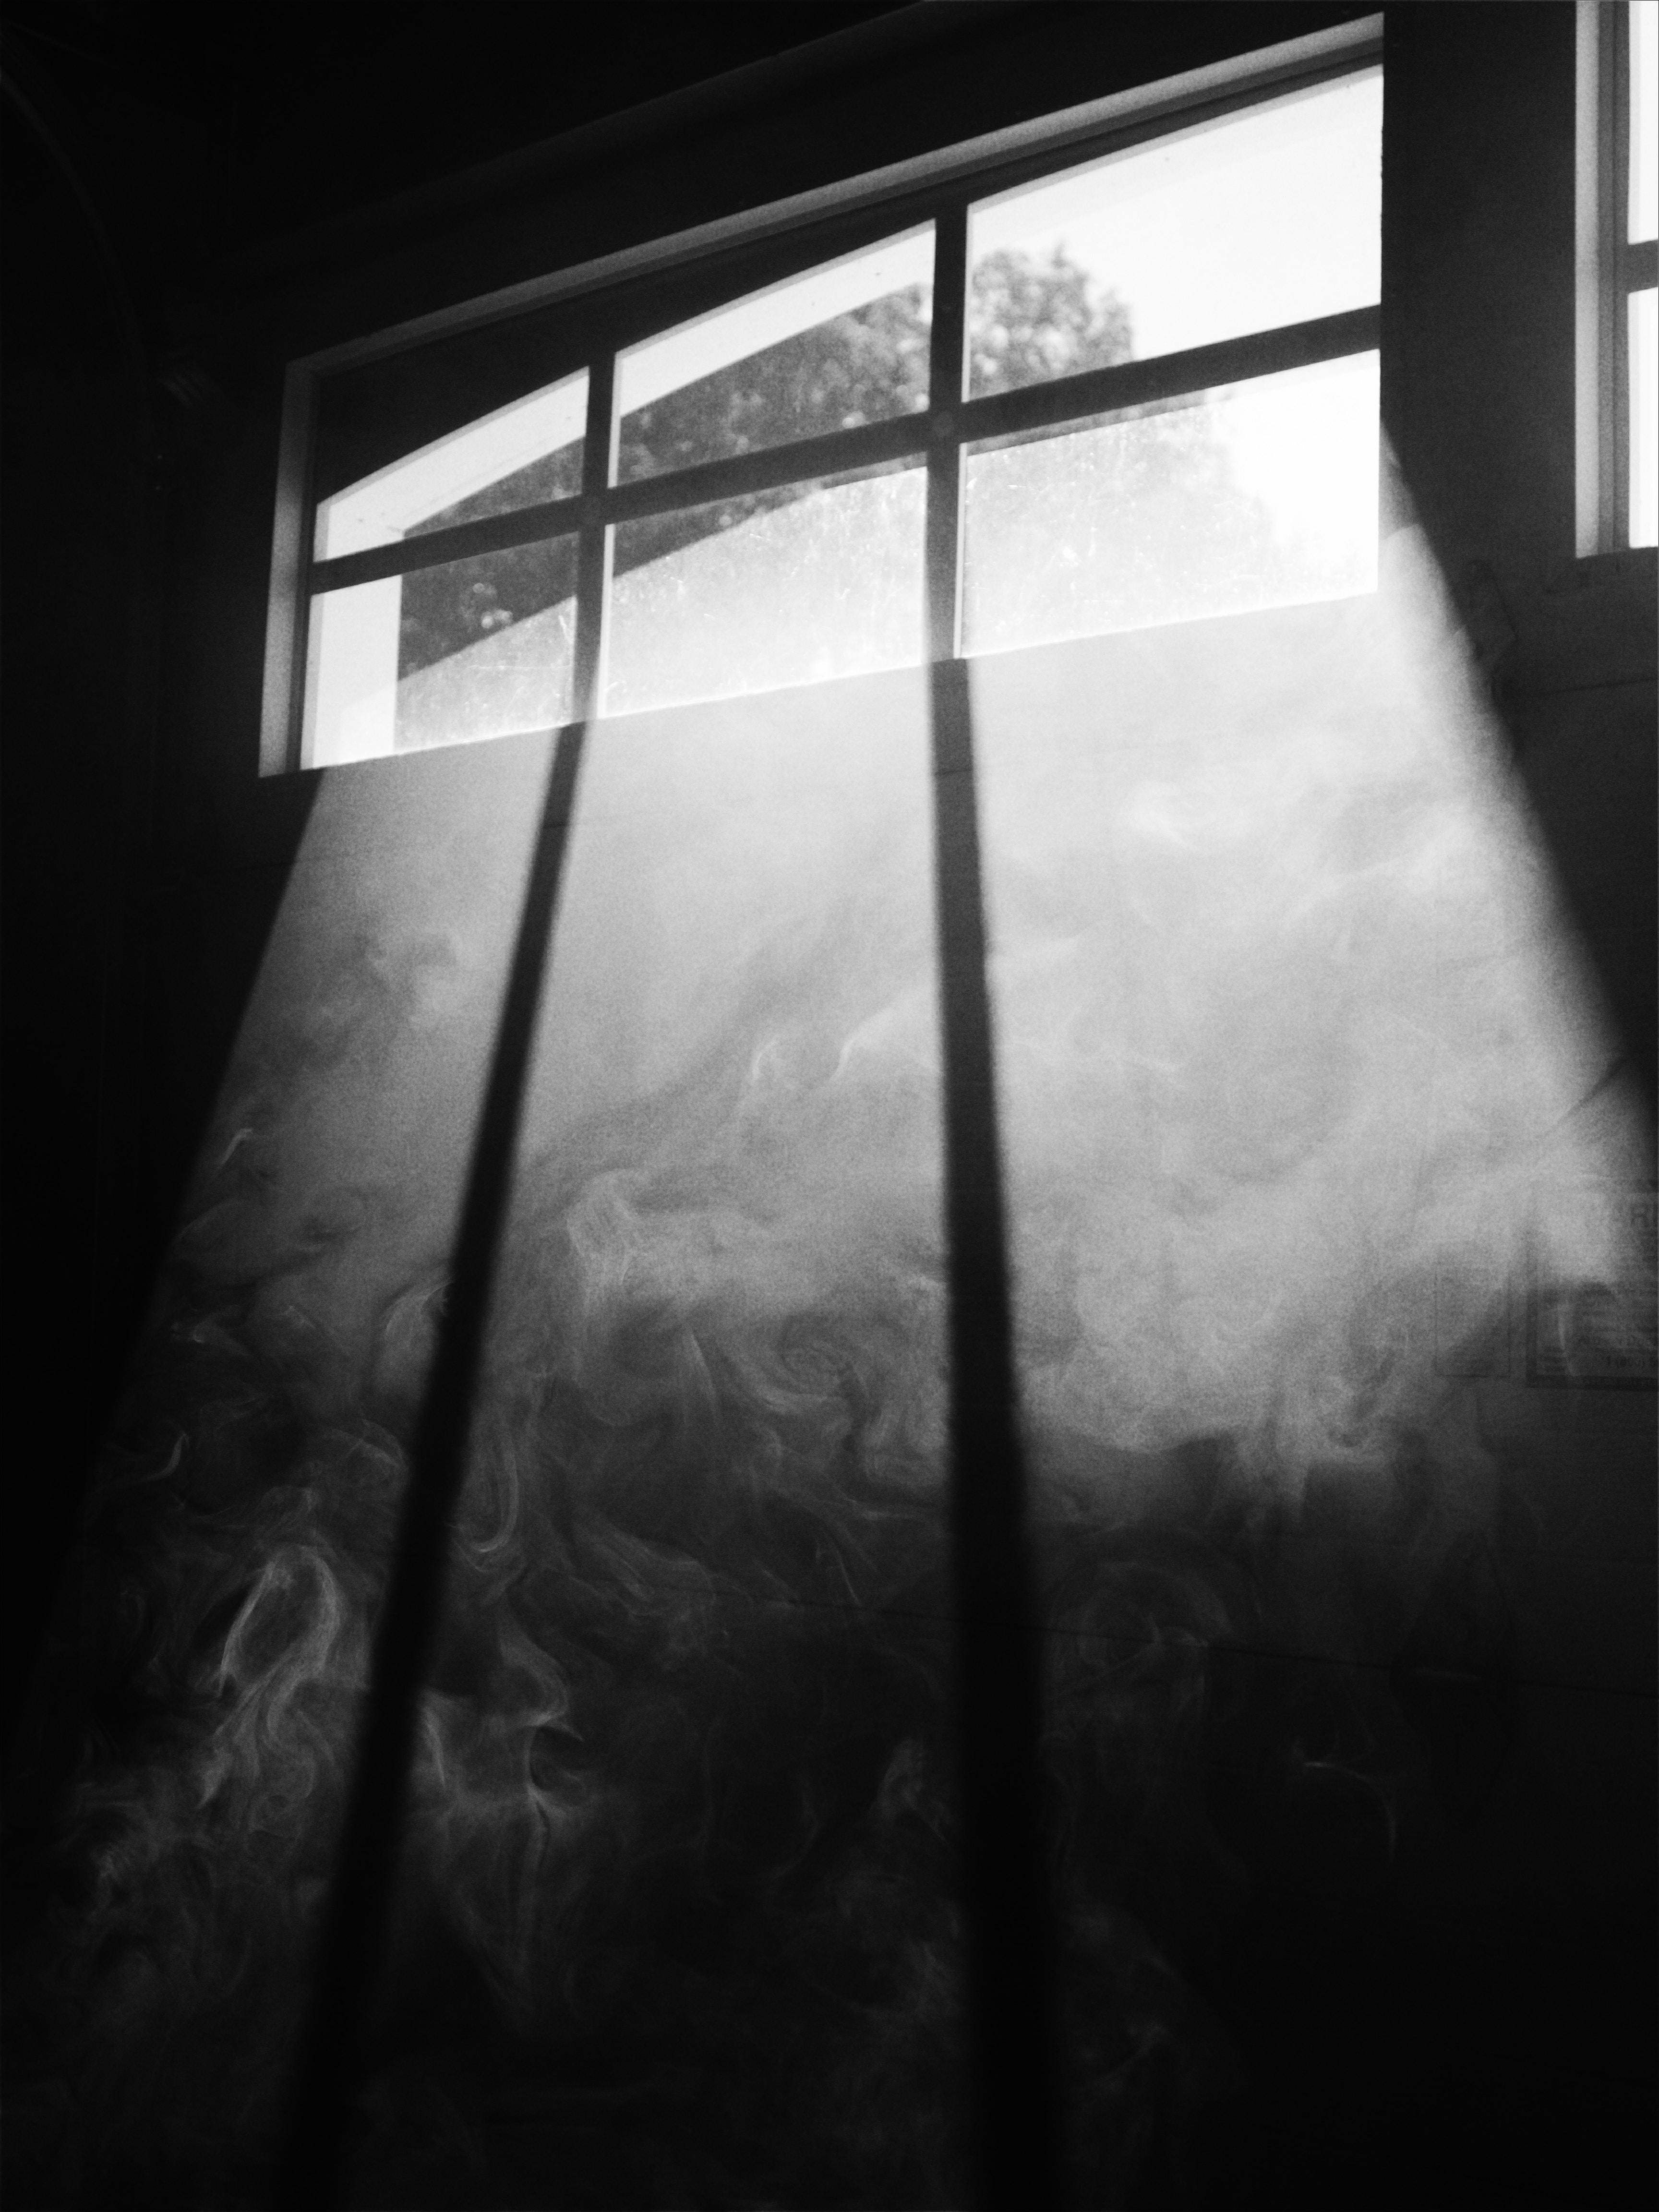 Smoke rising near a sunlit window from a garage